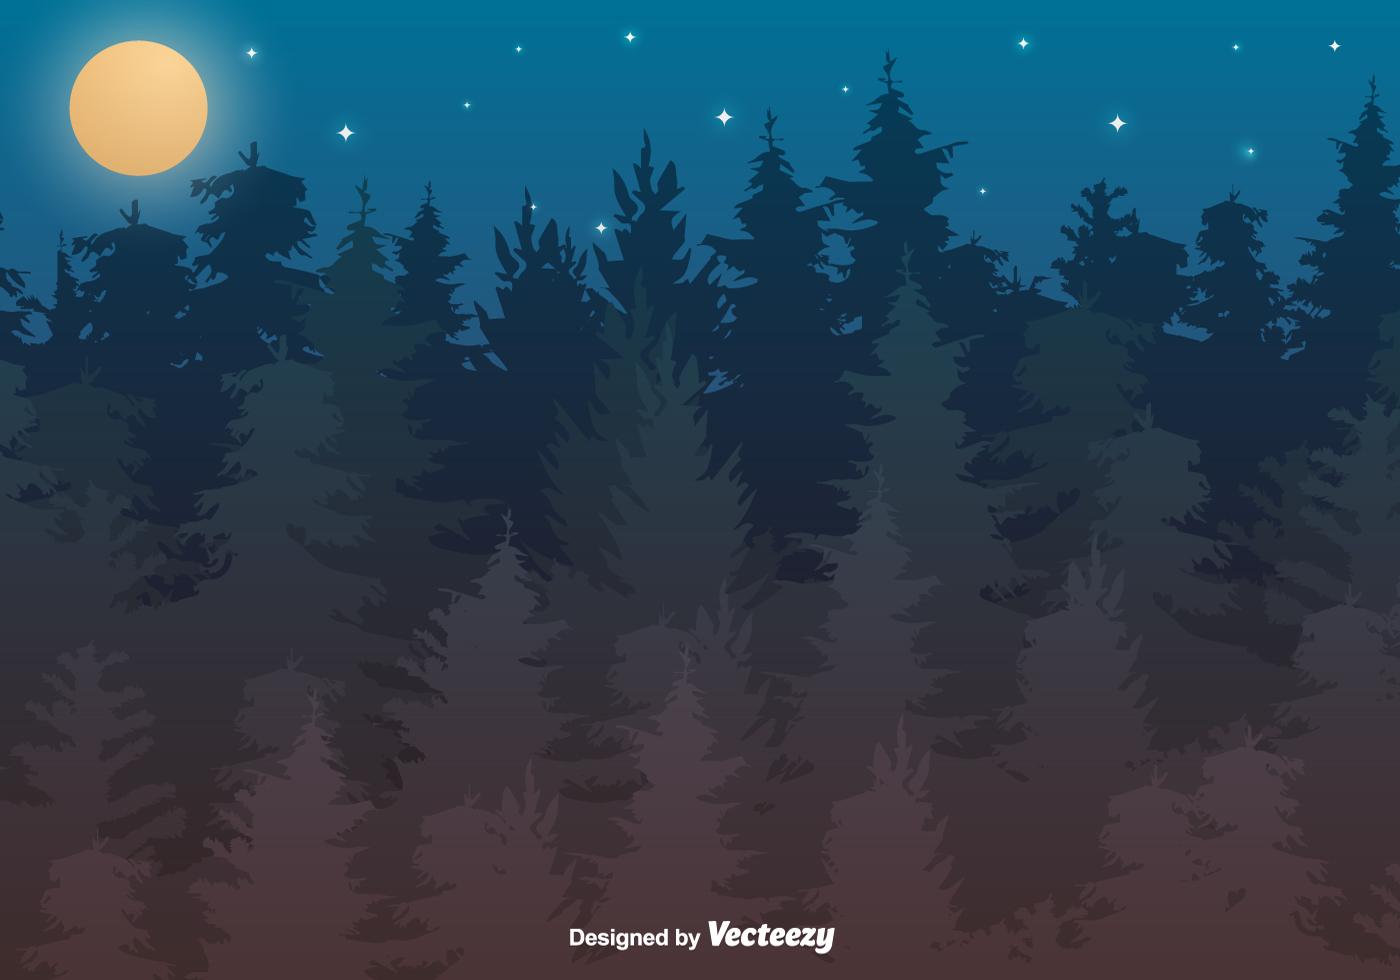 Buy Static Caravan >> Vector Forest Illustration - Download Free Vector Art, Stock Graphics & Images